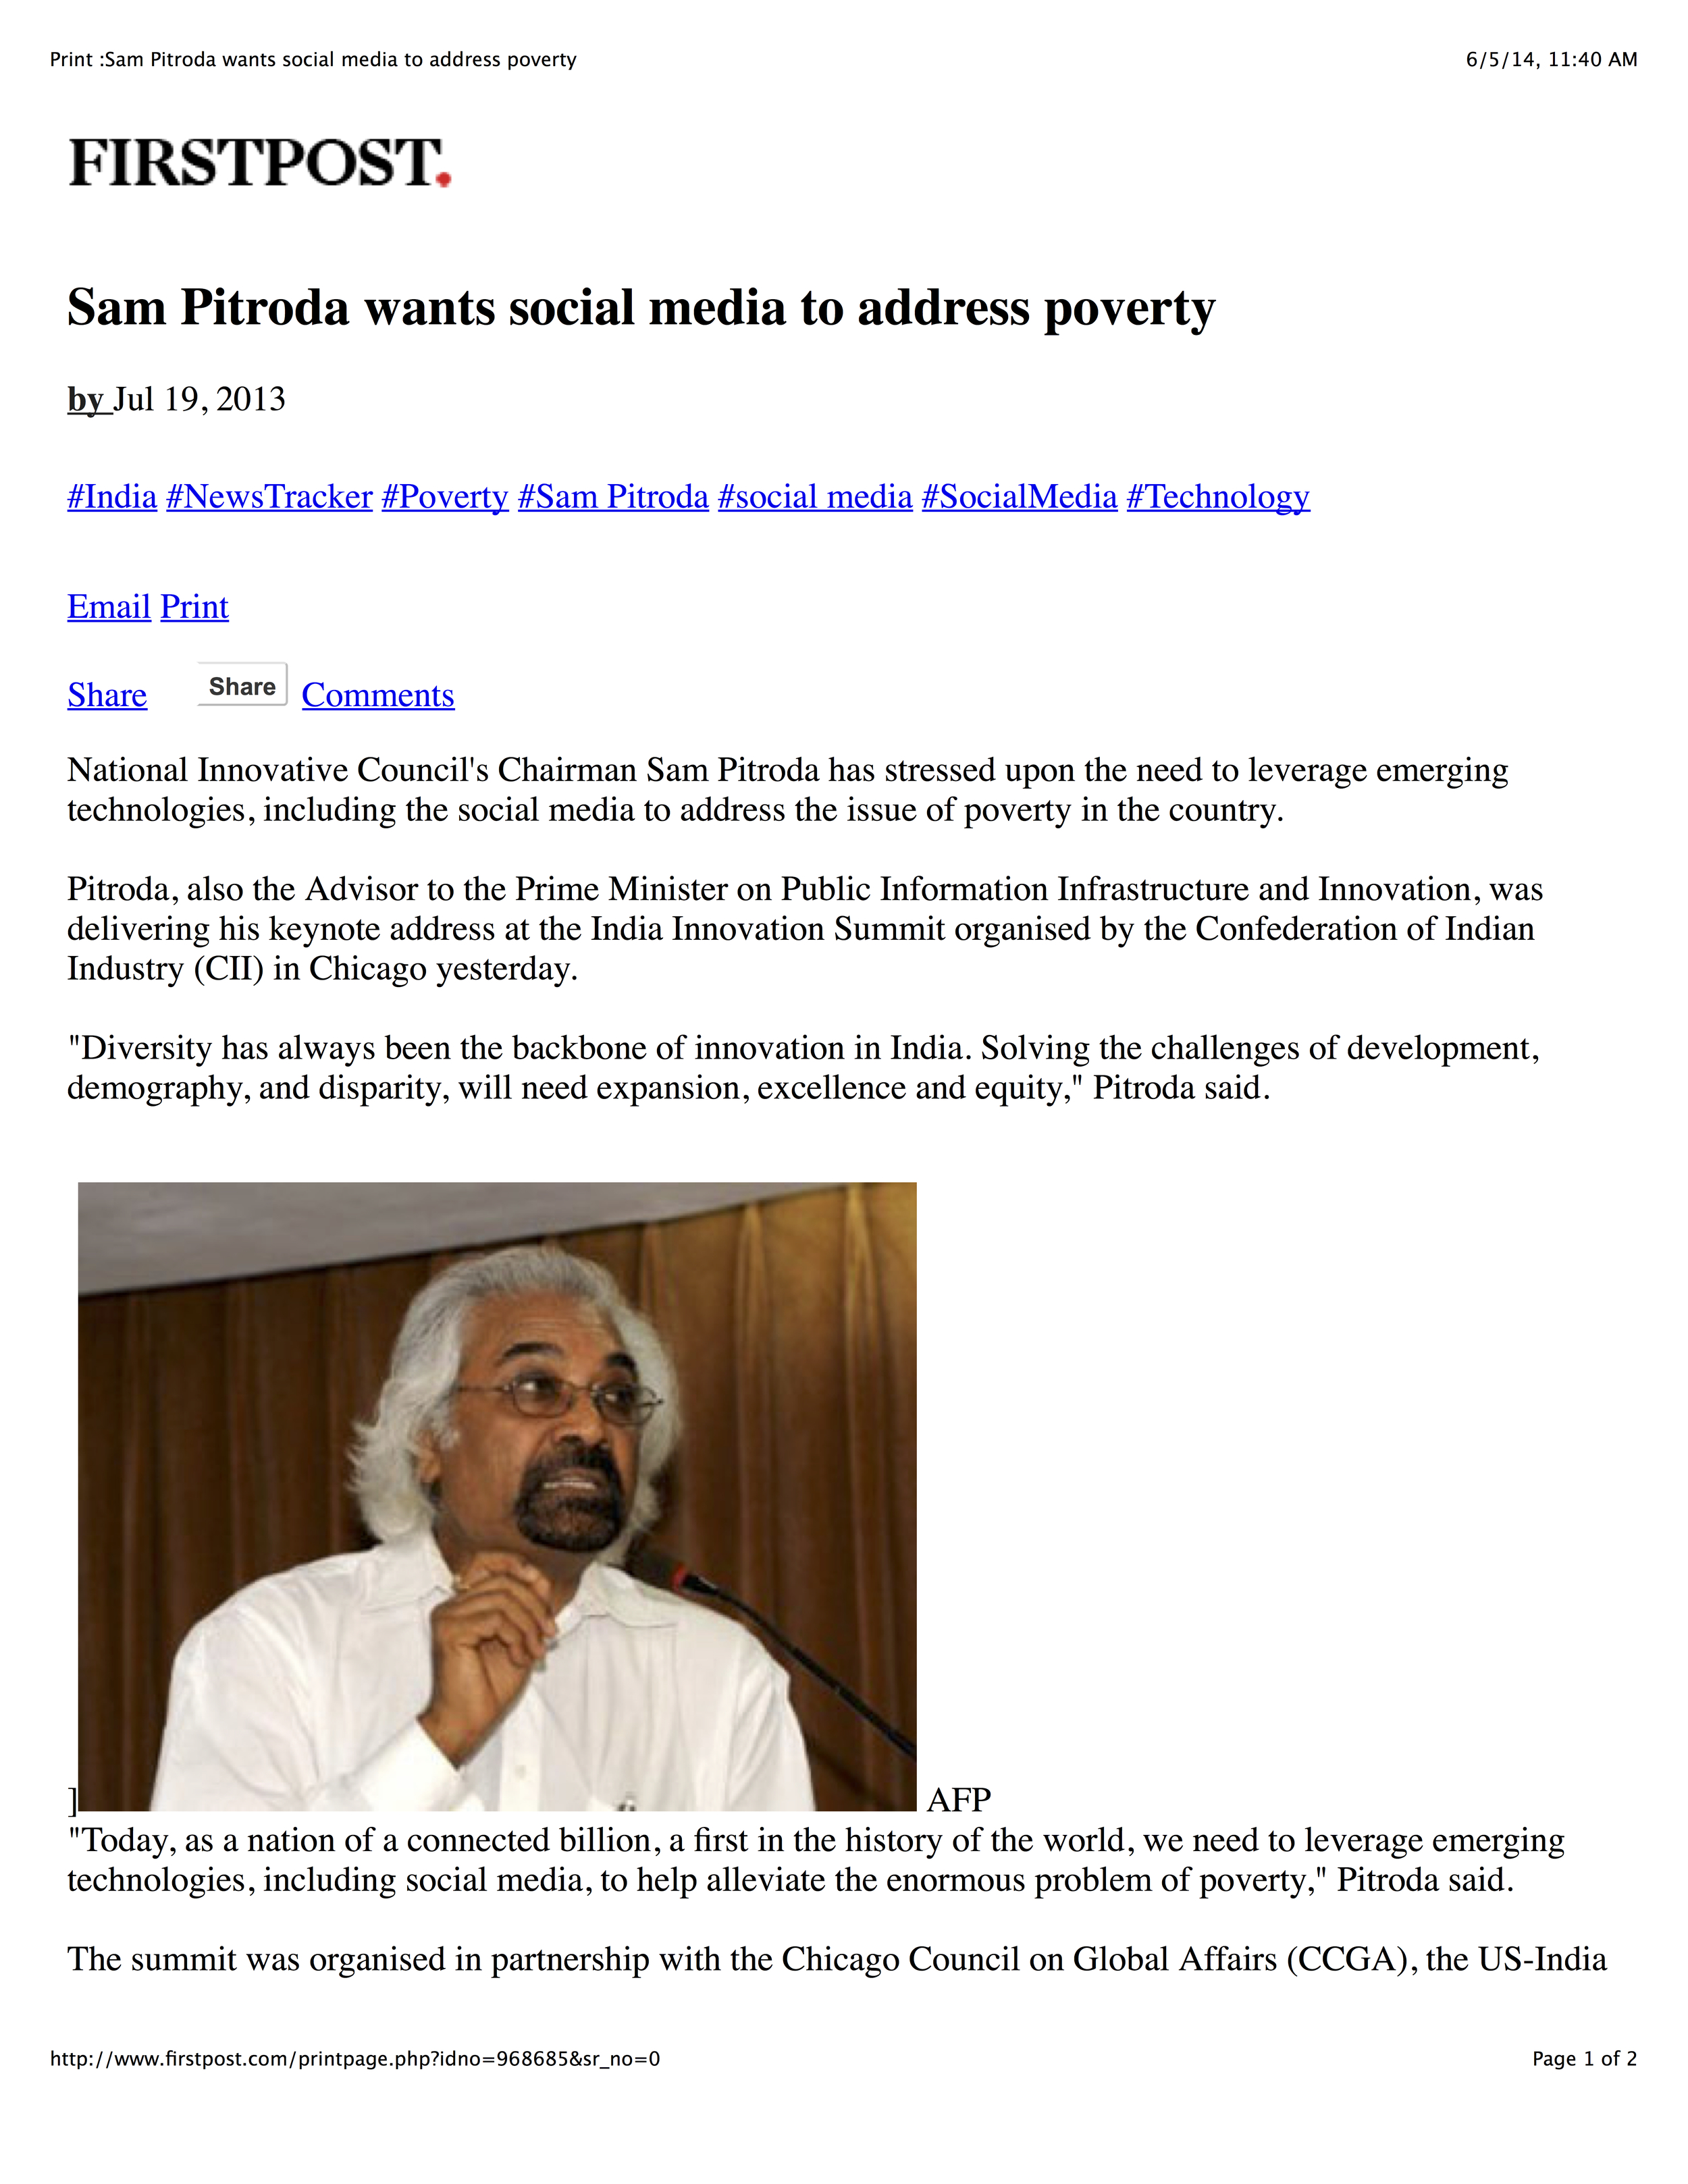 """Sam Pitroda Wants Social Media to Address Poverty,"" FirstPost, 2013"